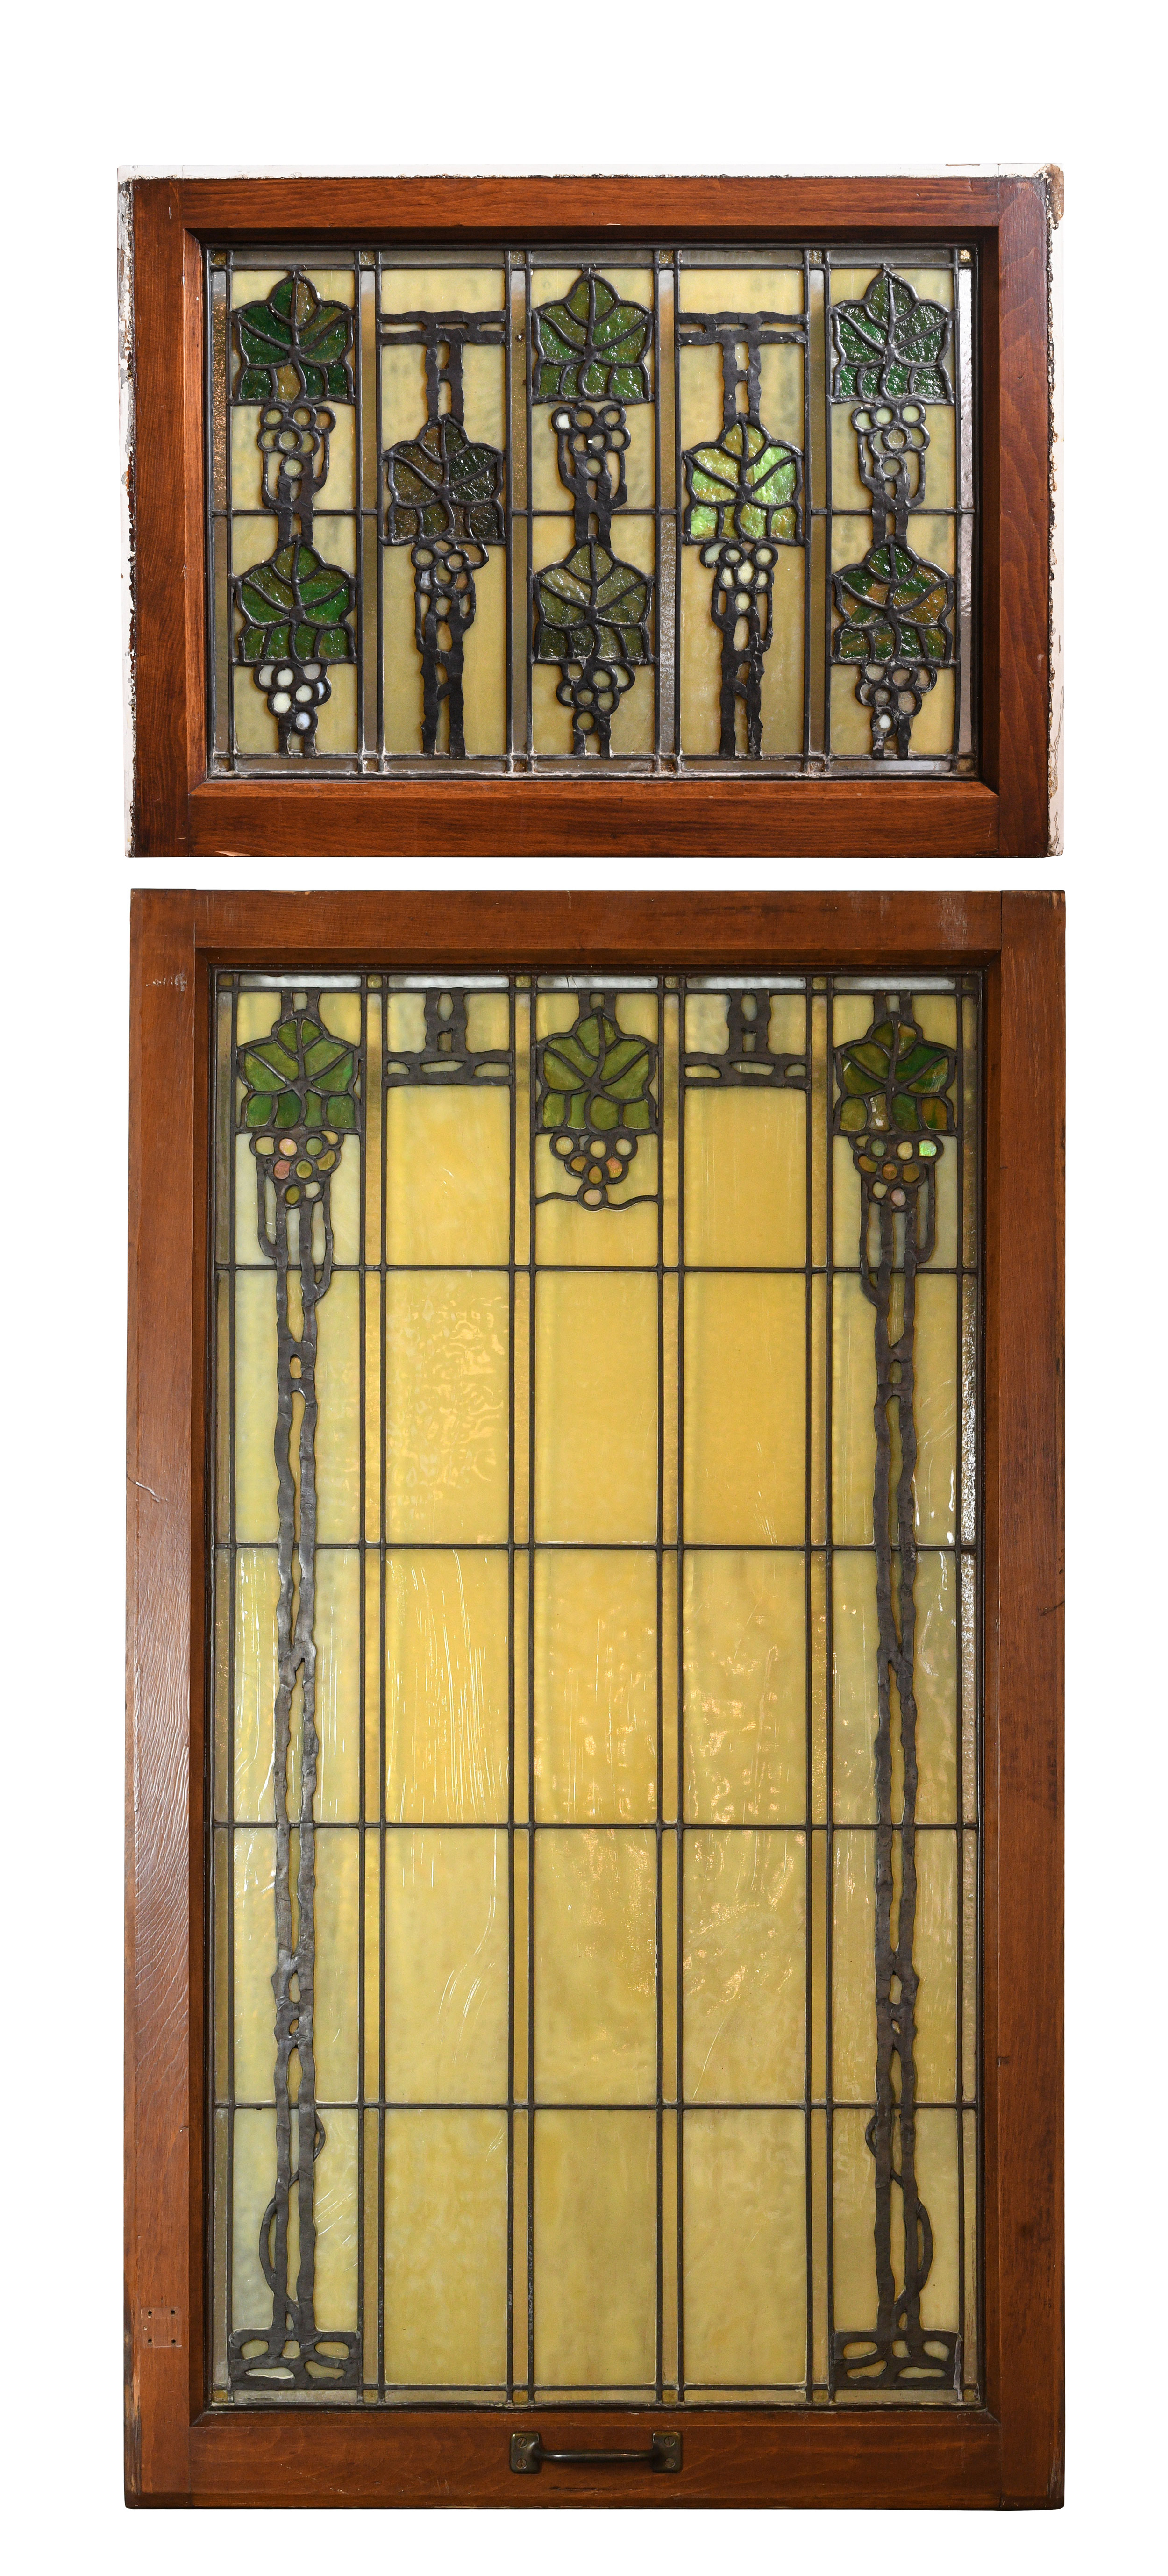 47809-bradstreet-grape-leaves-window-natural-wood-and-light-full.jpg